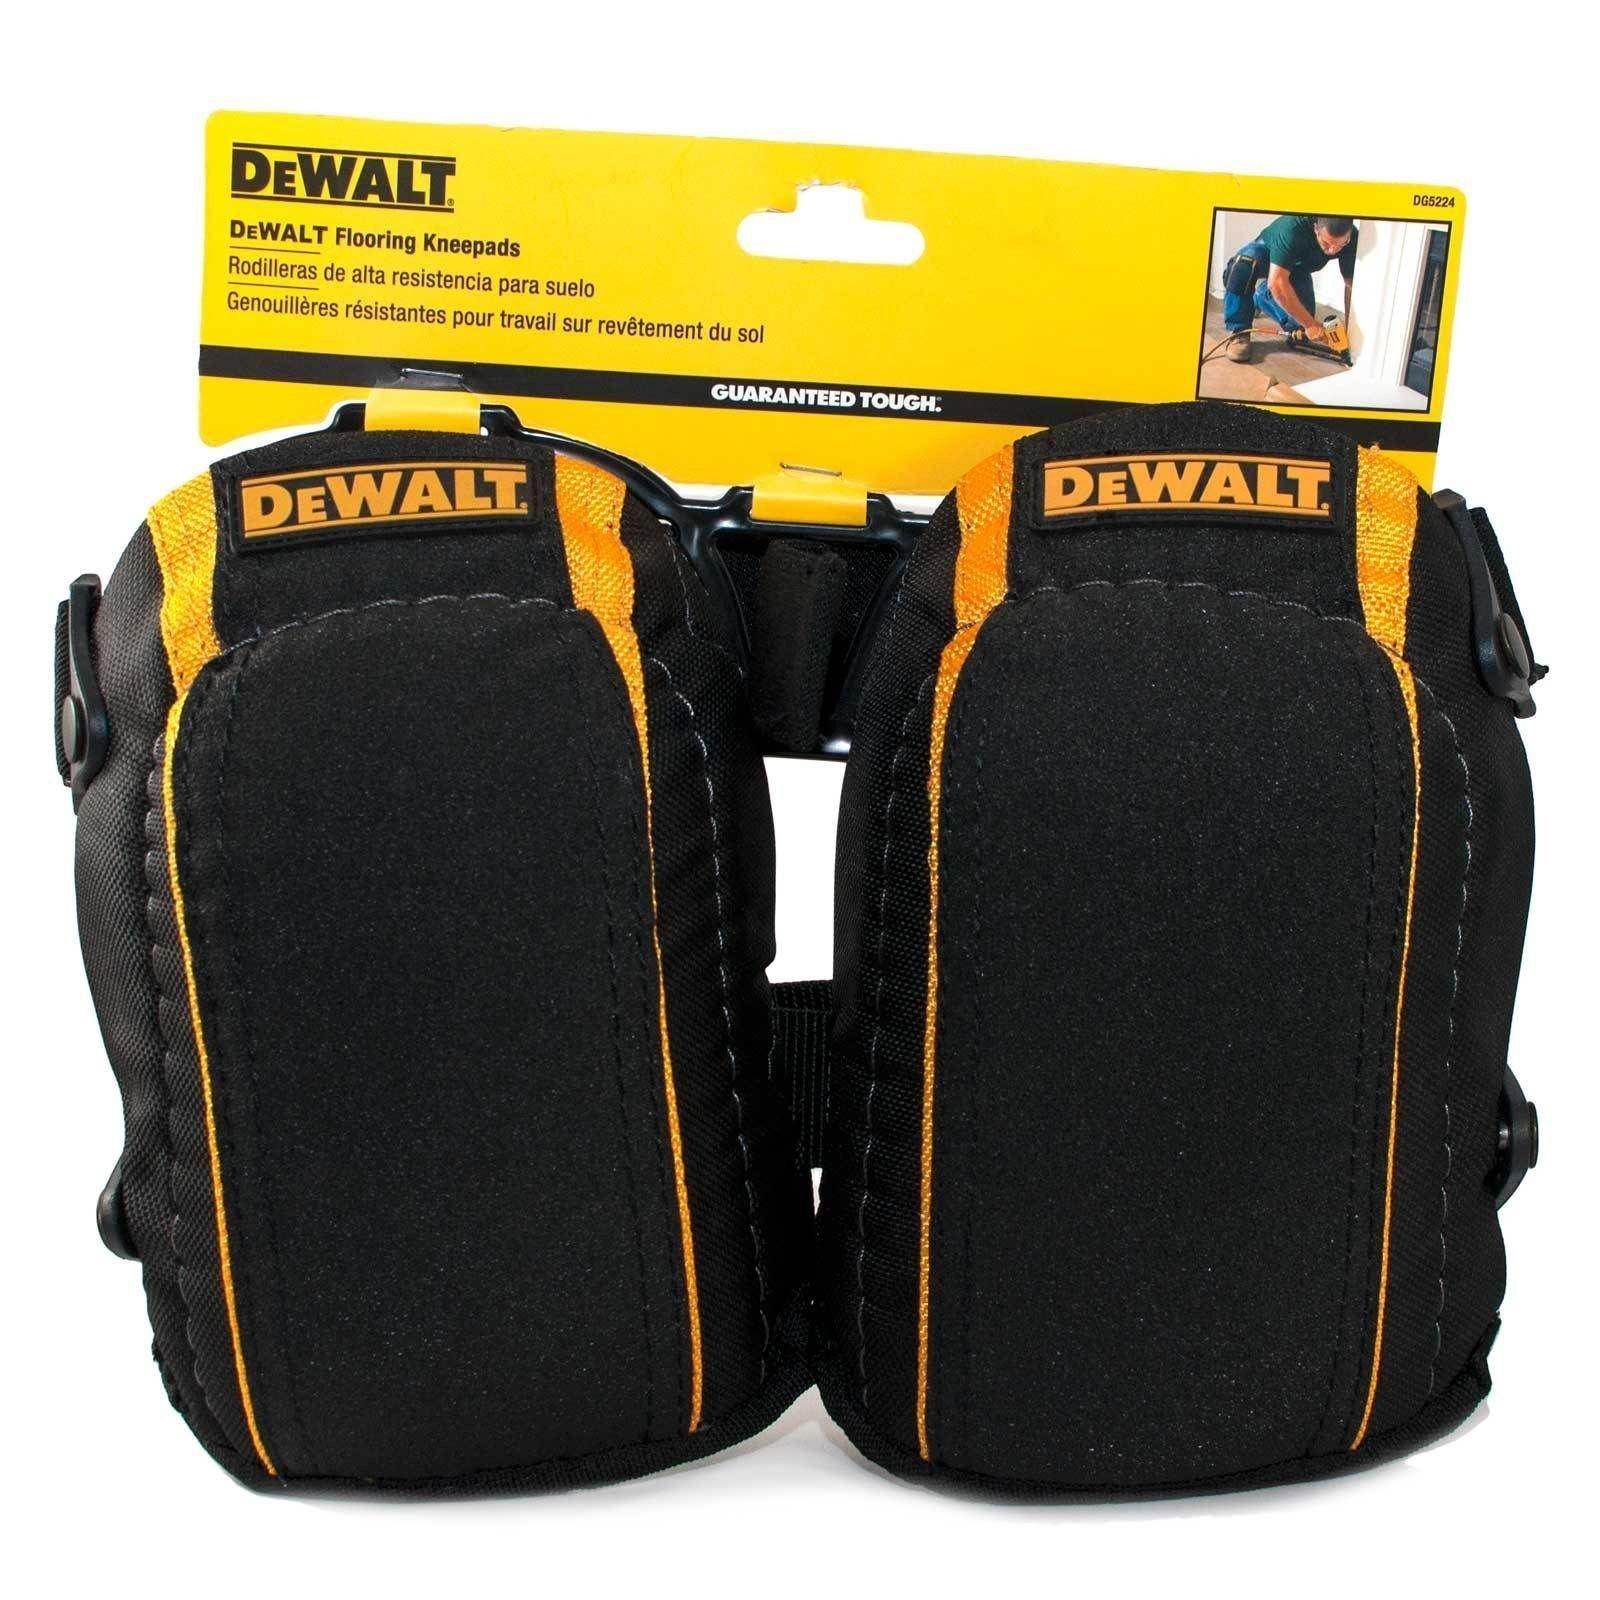 DeWalt Flooring Kneepads / Knee Pads Guaranteed Tough High Density Closed- Cell Foam